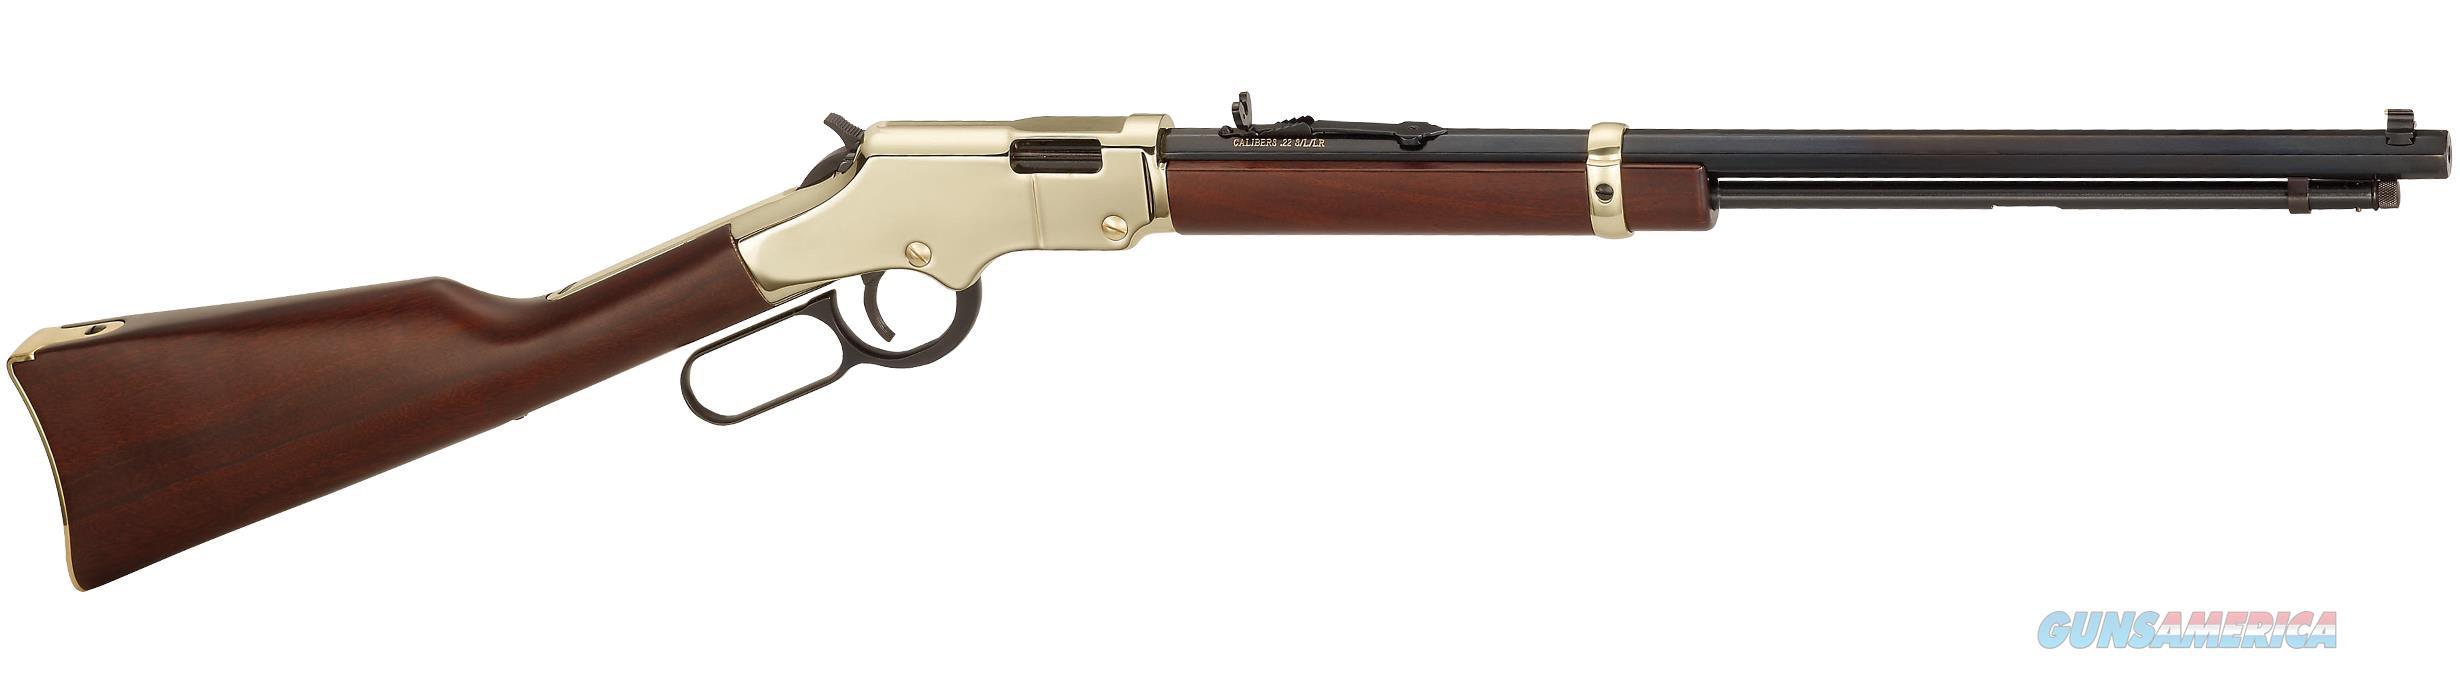 "Henry Repeating Arms HRA Golden Boy 22LR 20"" H004  Guns > Rifles > Henry Rifles - Replica"